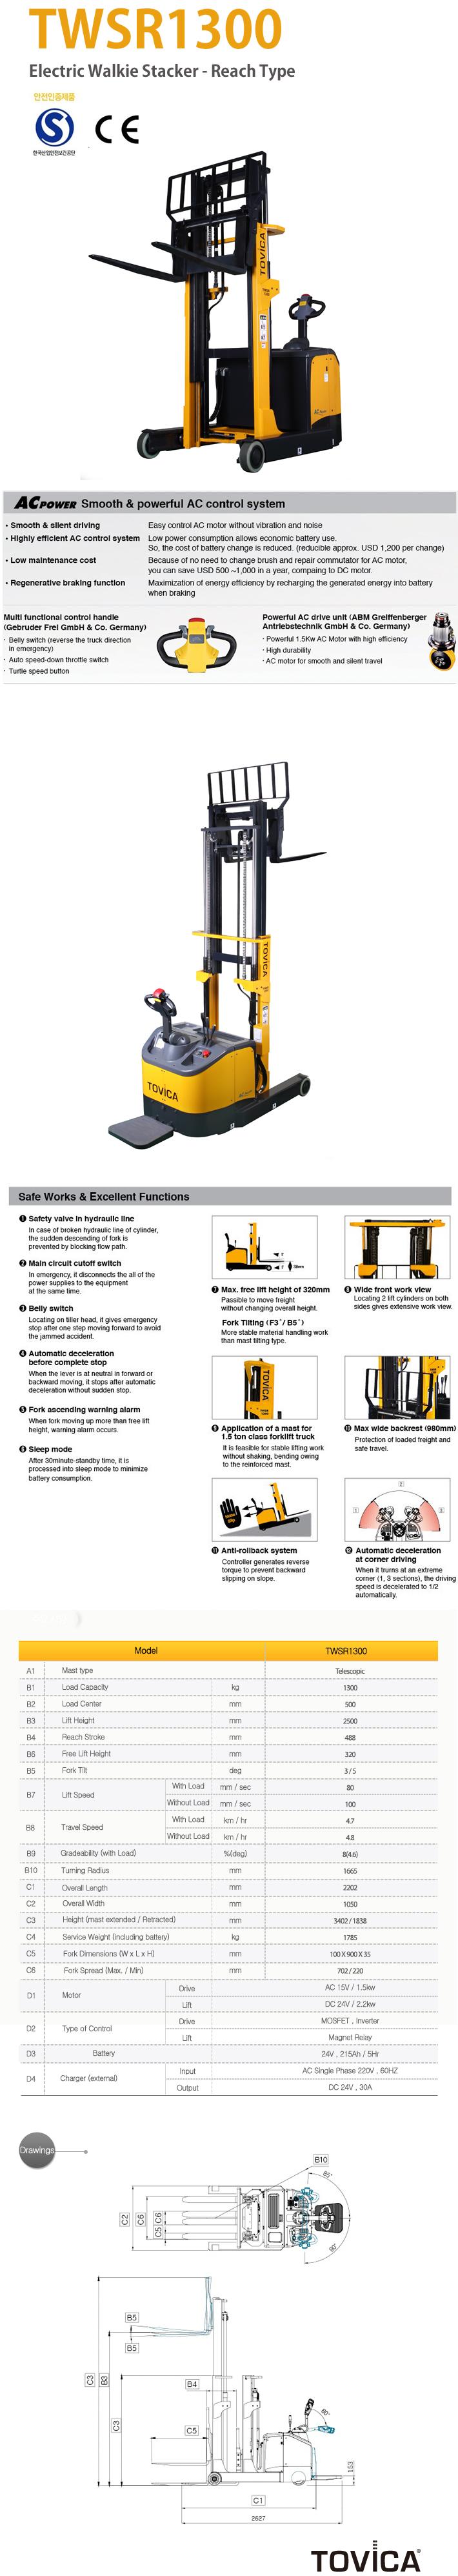 TAEJIN ENG Electric Walkie Stacker (Reach Type) TWSR1300